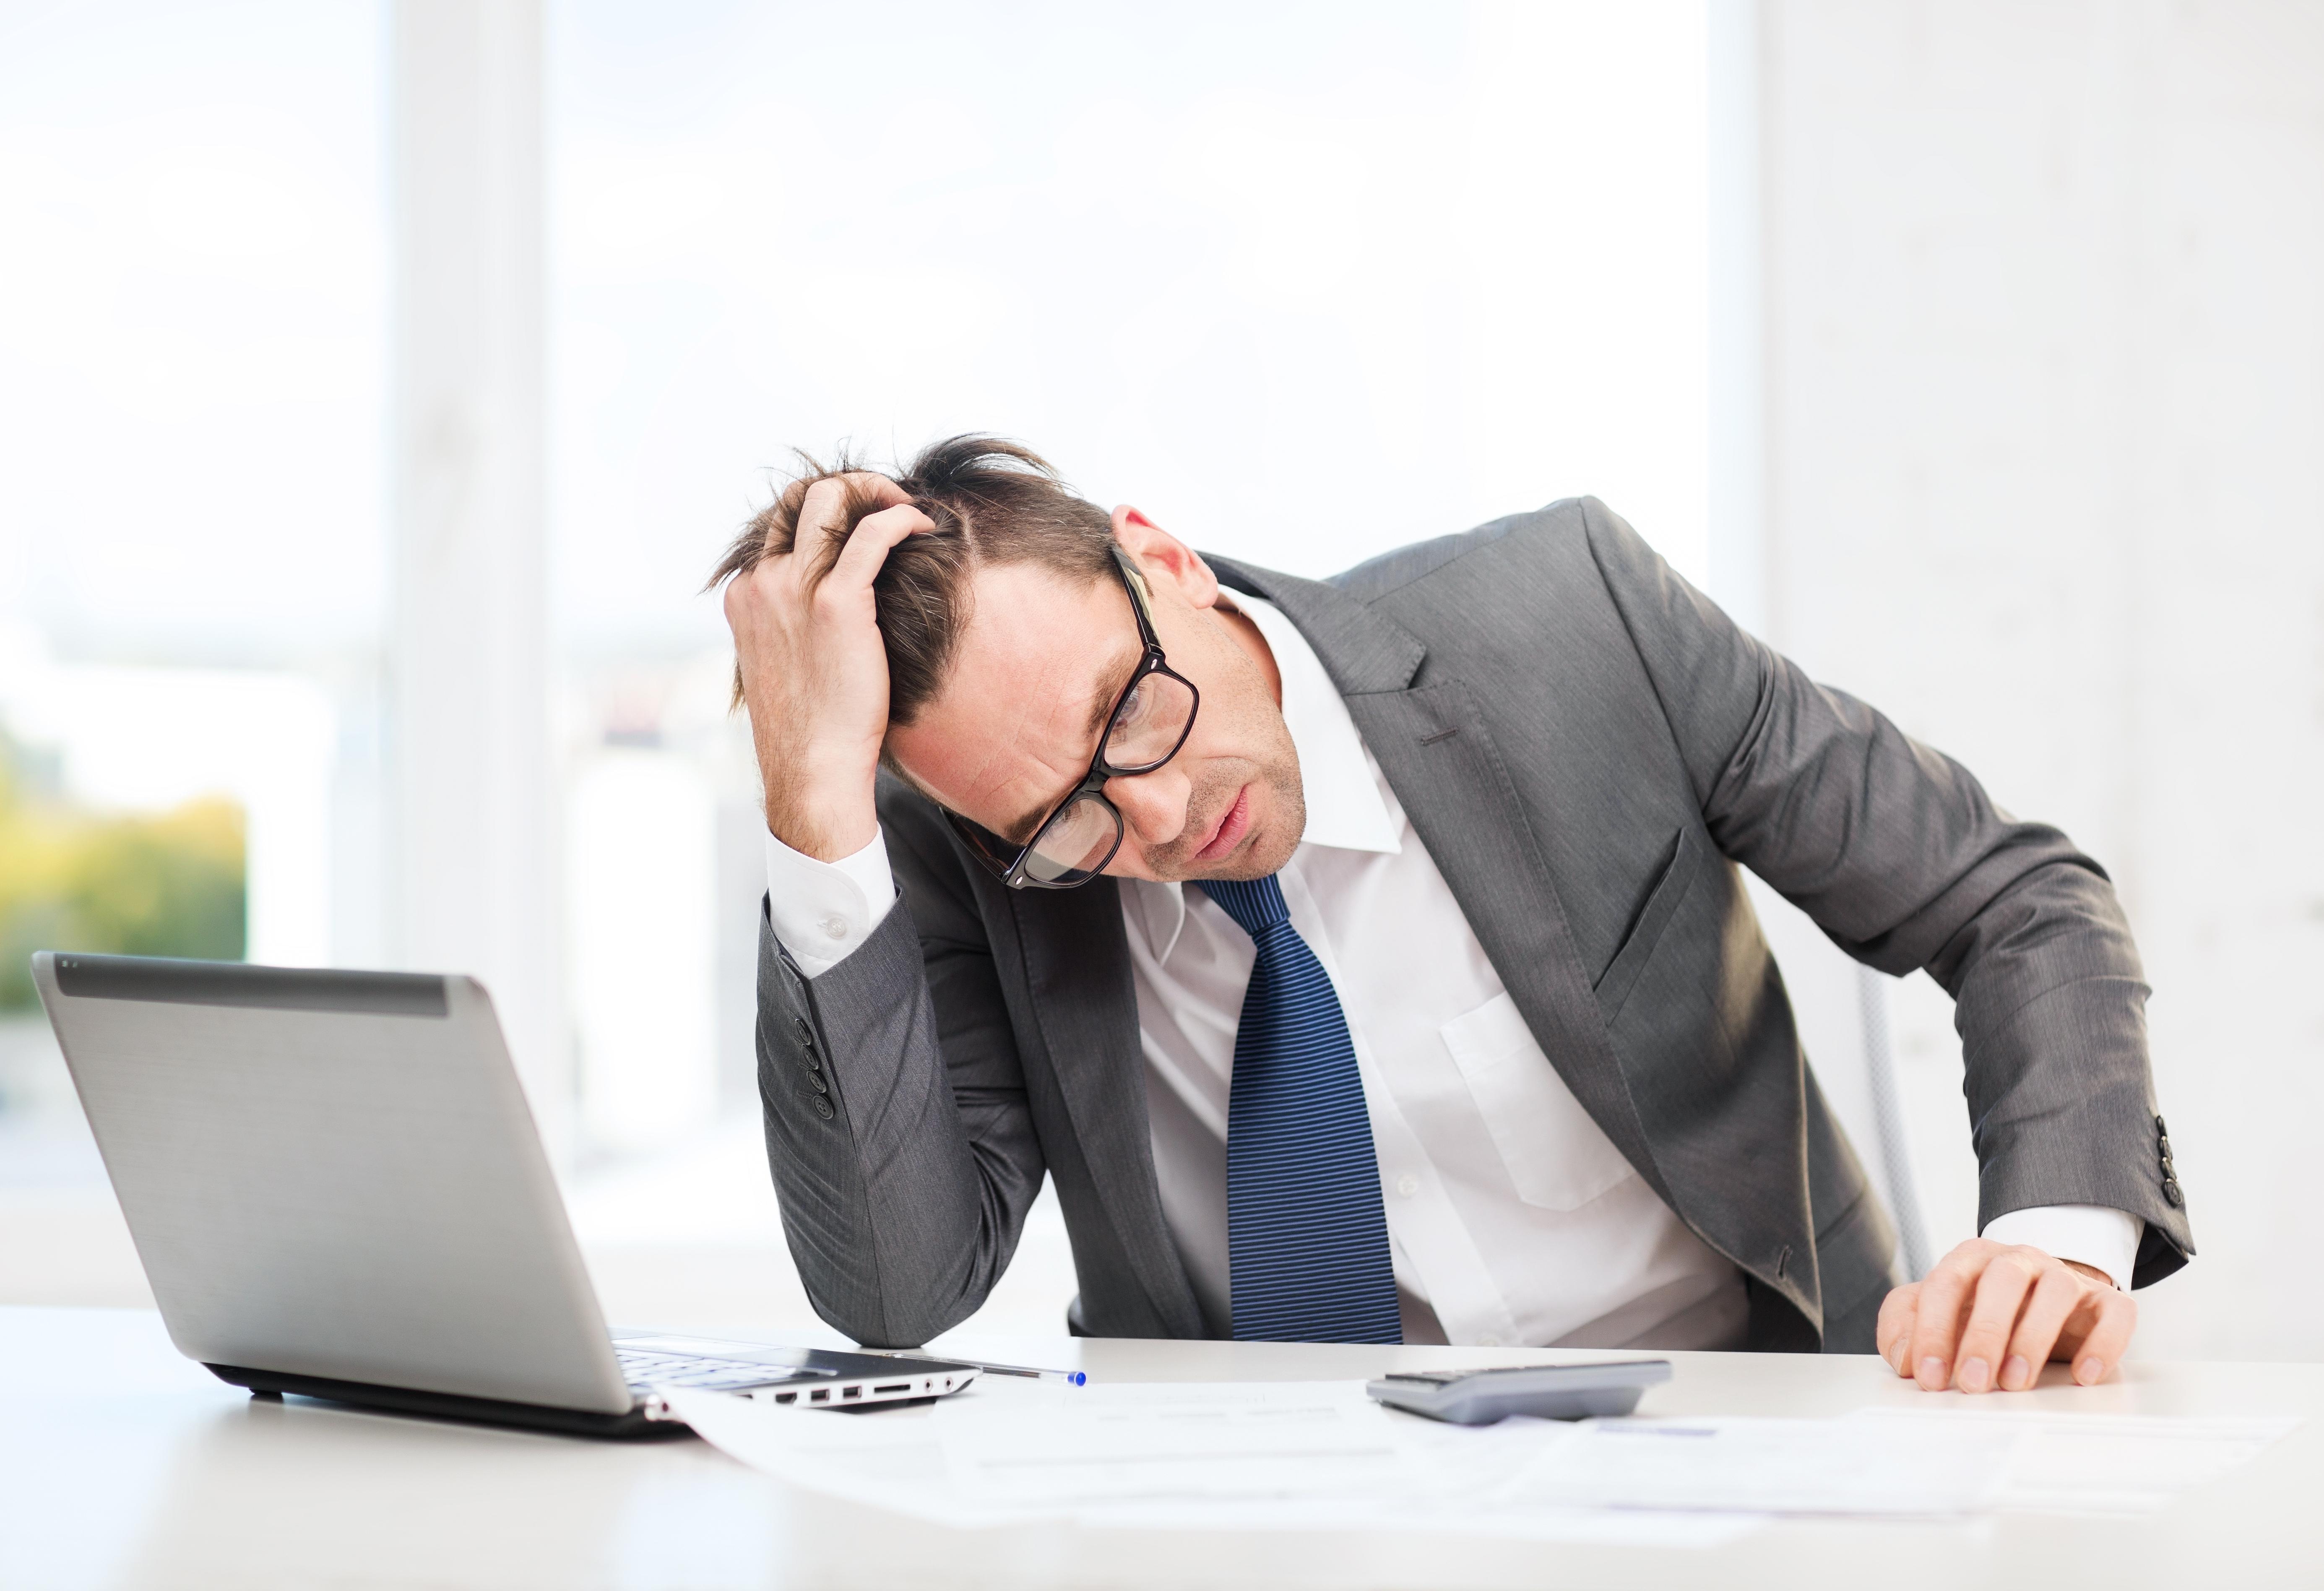 Farre konkurser i november